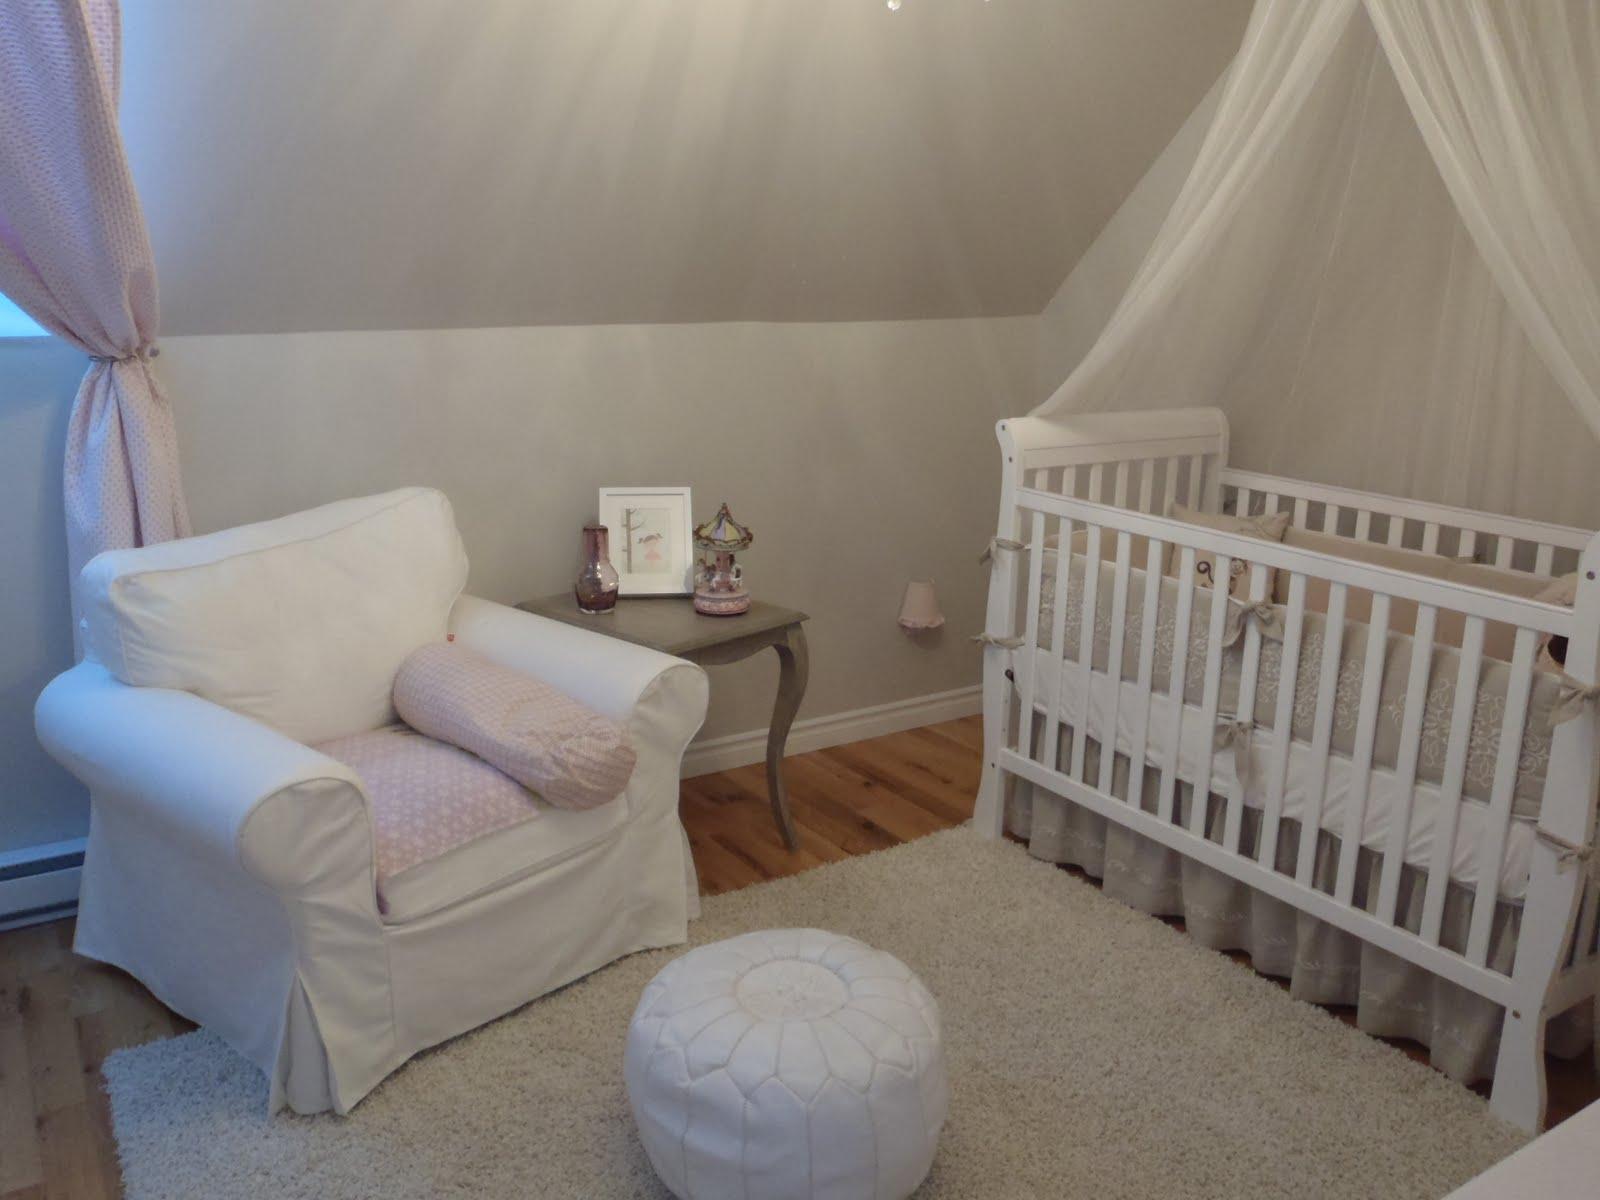 sandra en outaouais la chambre de b b. Black Bedroom Furniture Sets. Home Design Ideas